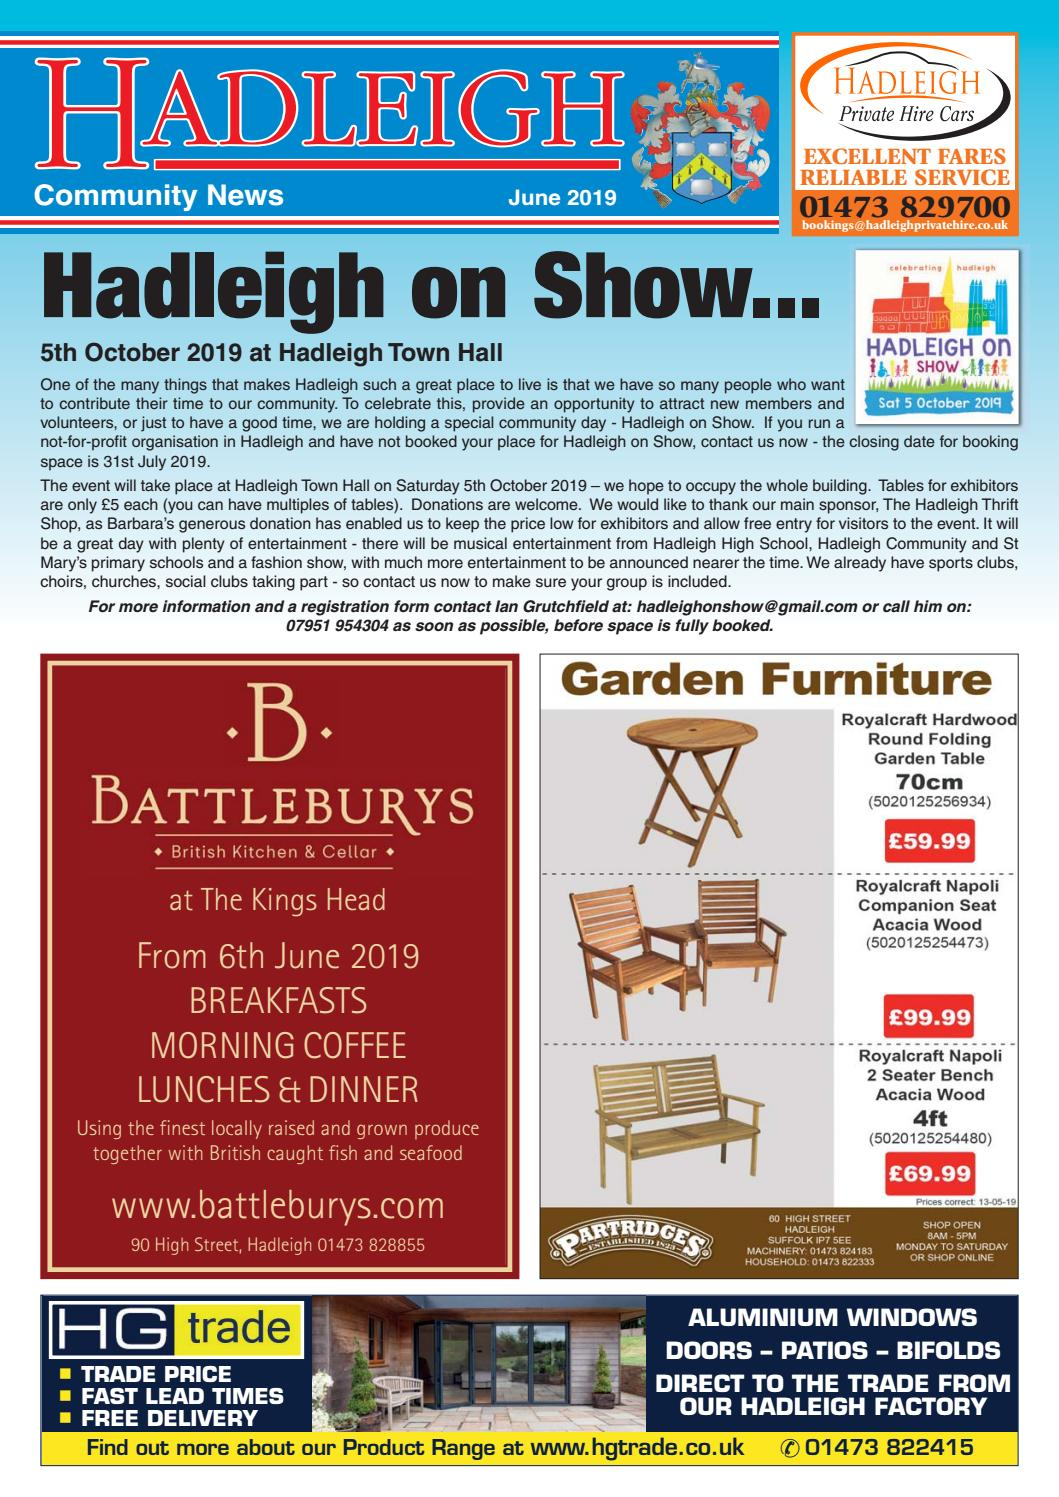 Hadleigh Community News, June 2019 by Keith Avis Printers